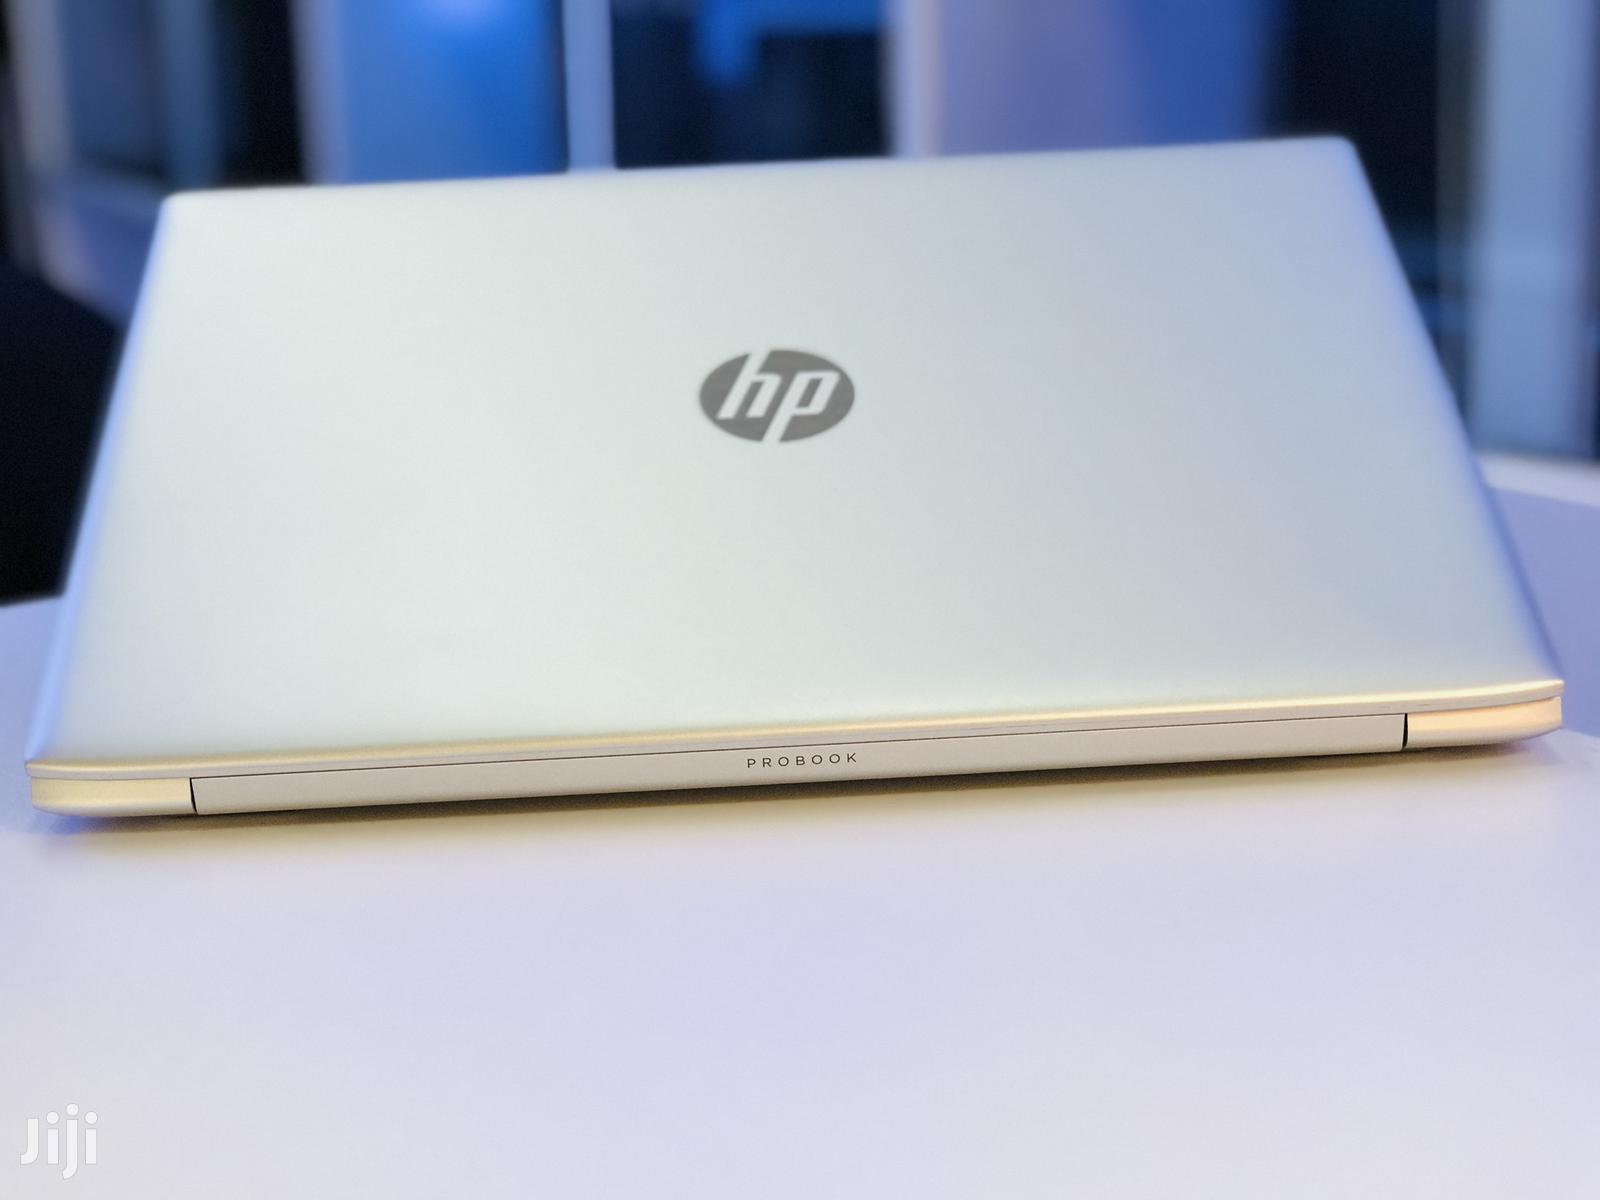 New Laptop HP ProBook 450 G5 8GB Intel Core I5 SSHD (Hybrid) 1T